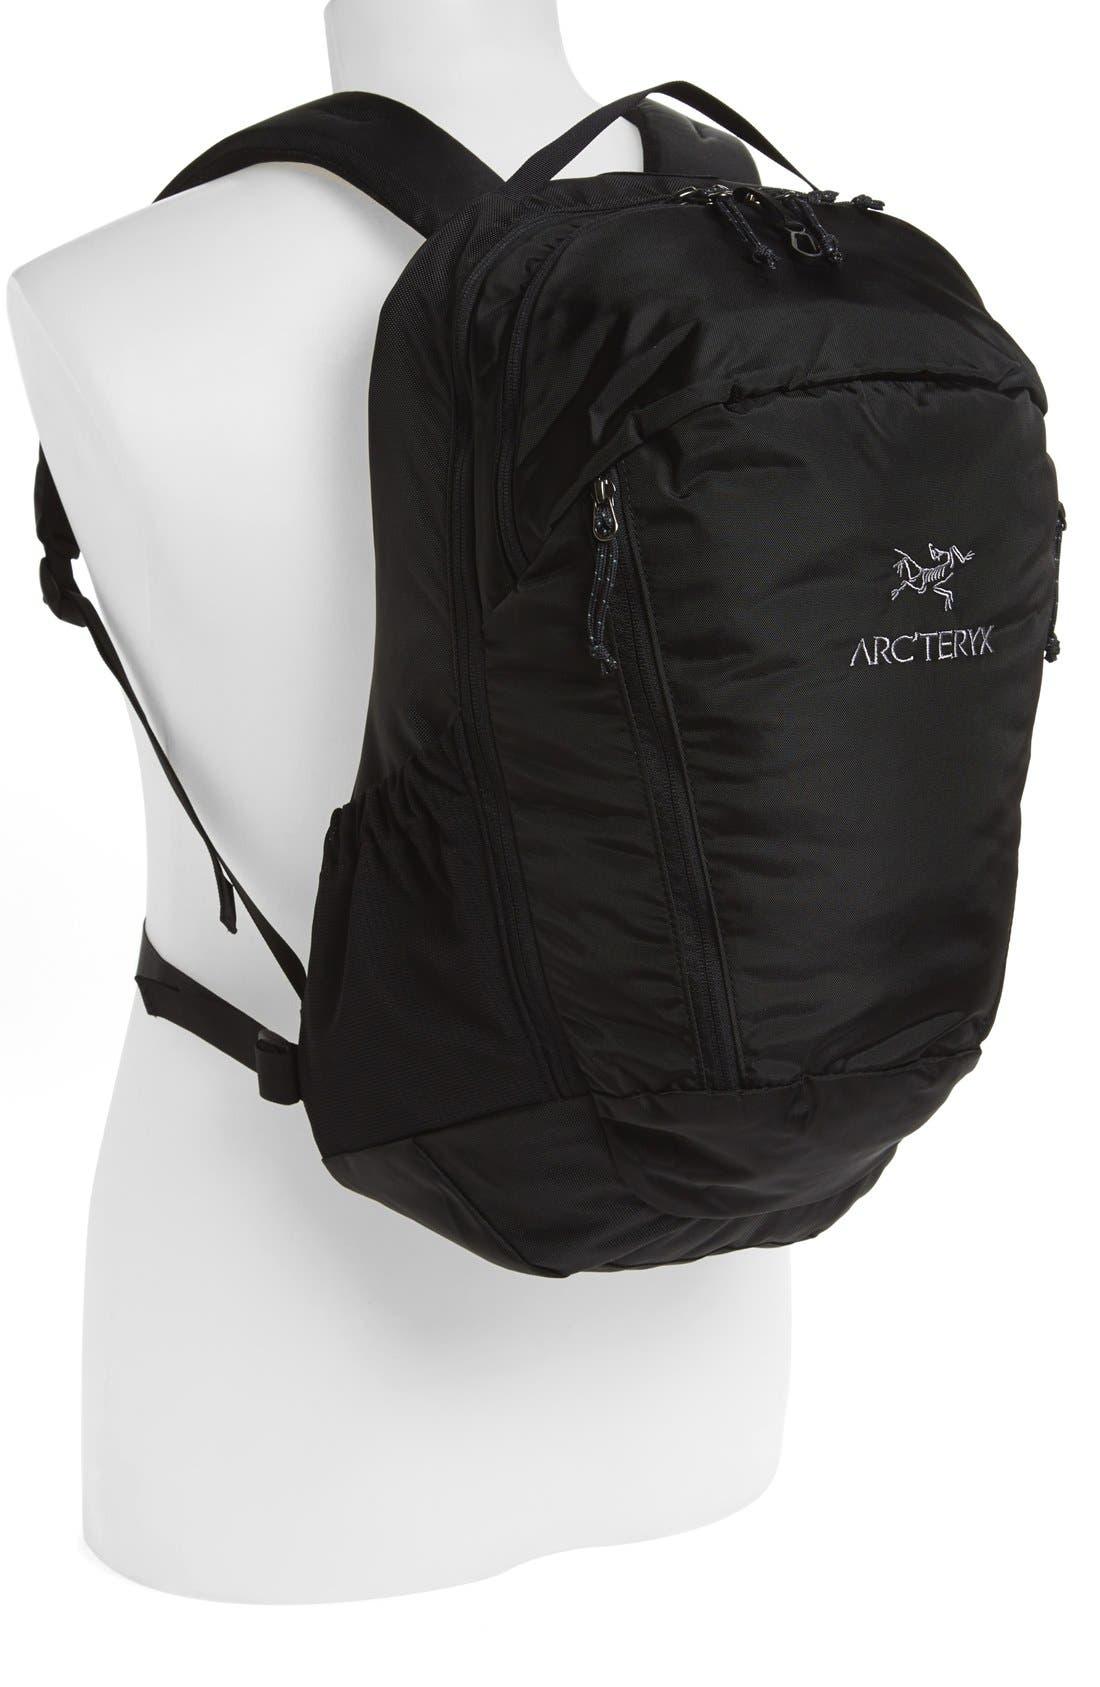 ARC'TERYX,                             'Mantis 26L' Backpack,                             Alternate thumbnail 3, color,                             001